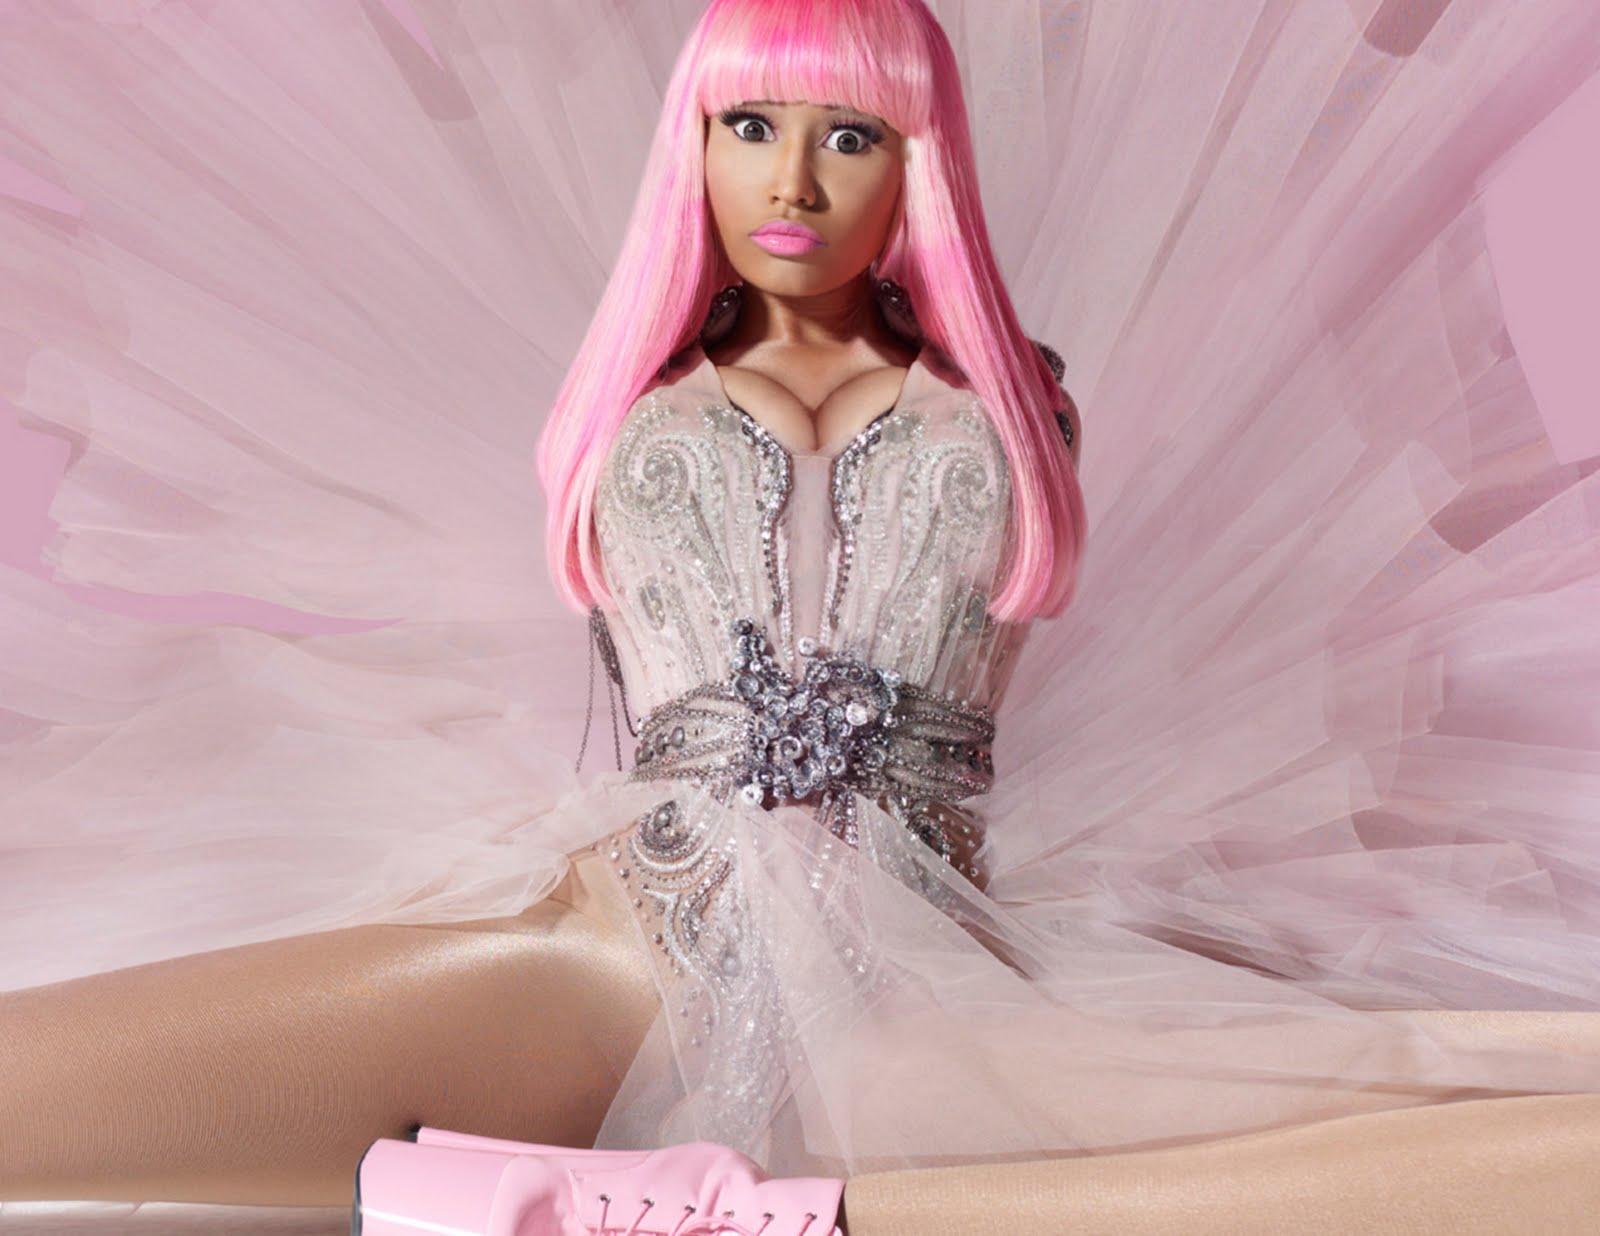 http://3.bp.blogspot.com/_s4kh02jfSZg/TOvNngkjxxI/AAAAAAAAQAY/mejbVDdBigQ/s1600/Pink4Friday-Beauty-300.jpg